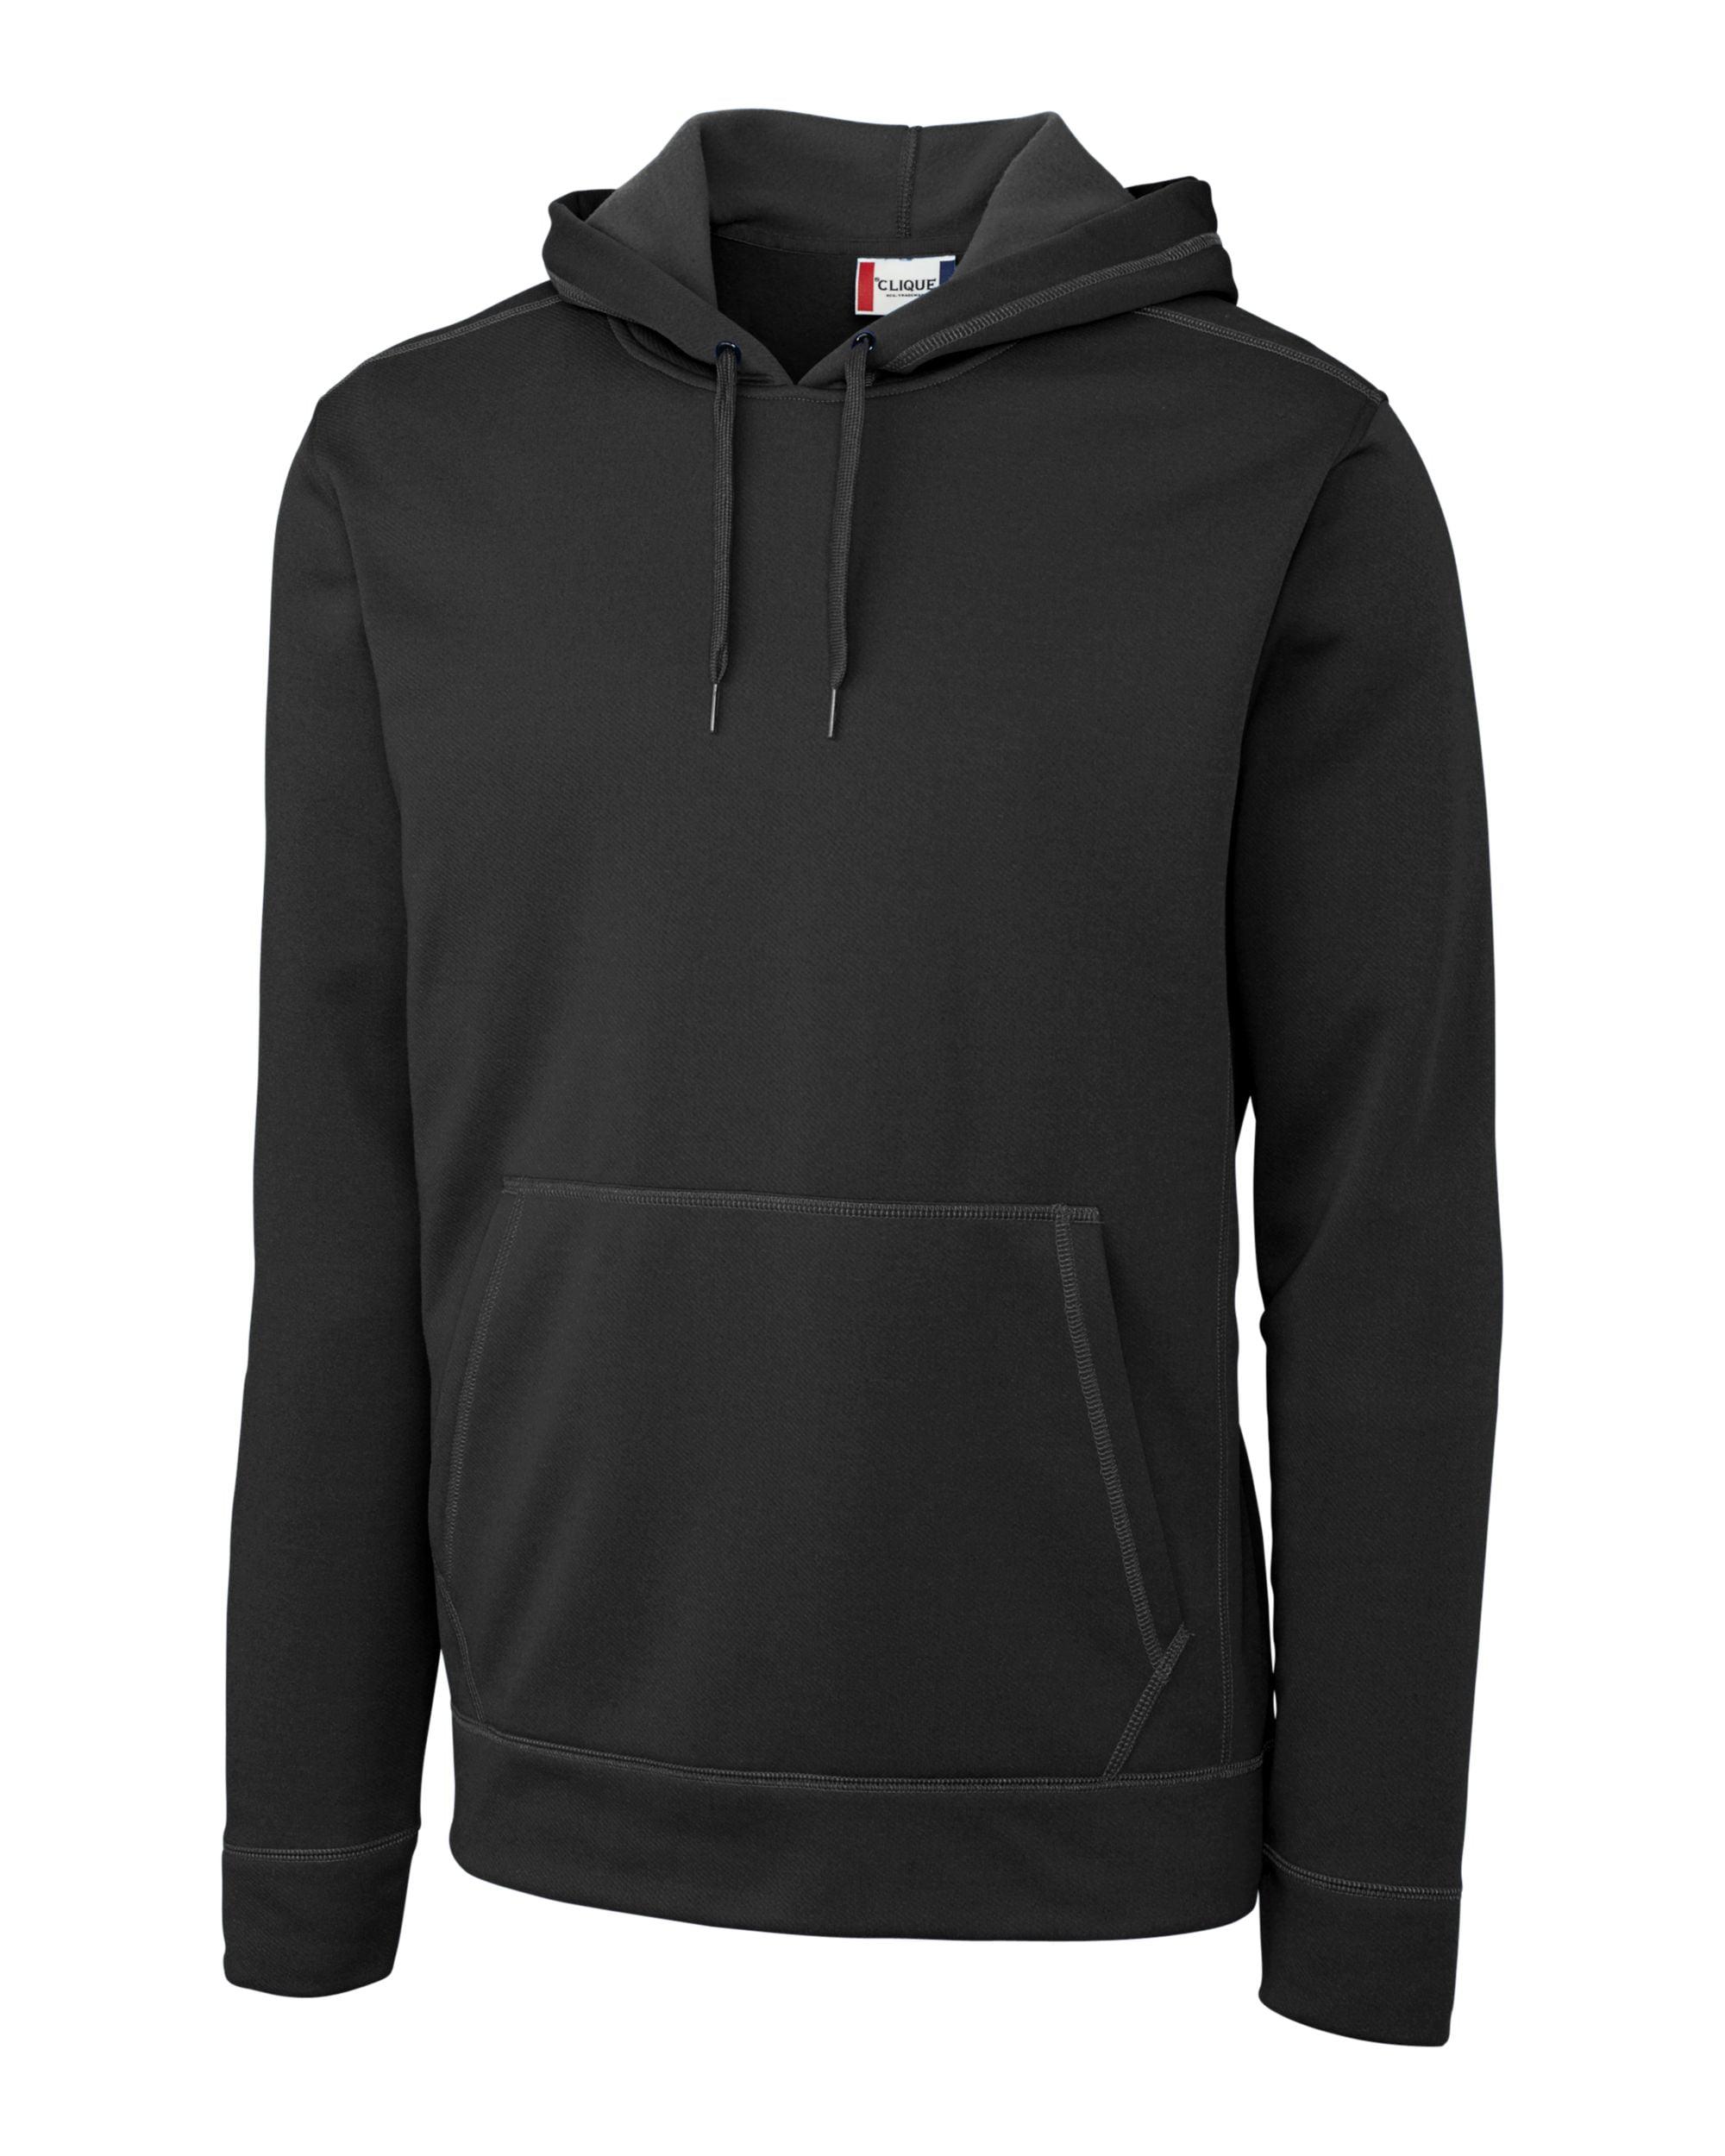 clique cliquenew wave men's vaasa pullover hoodie